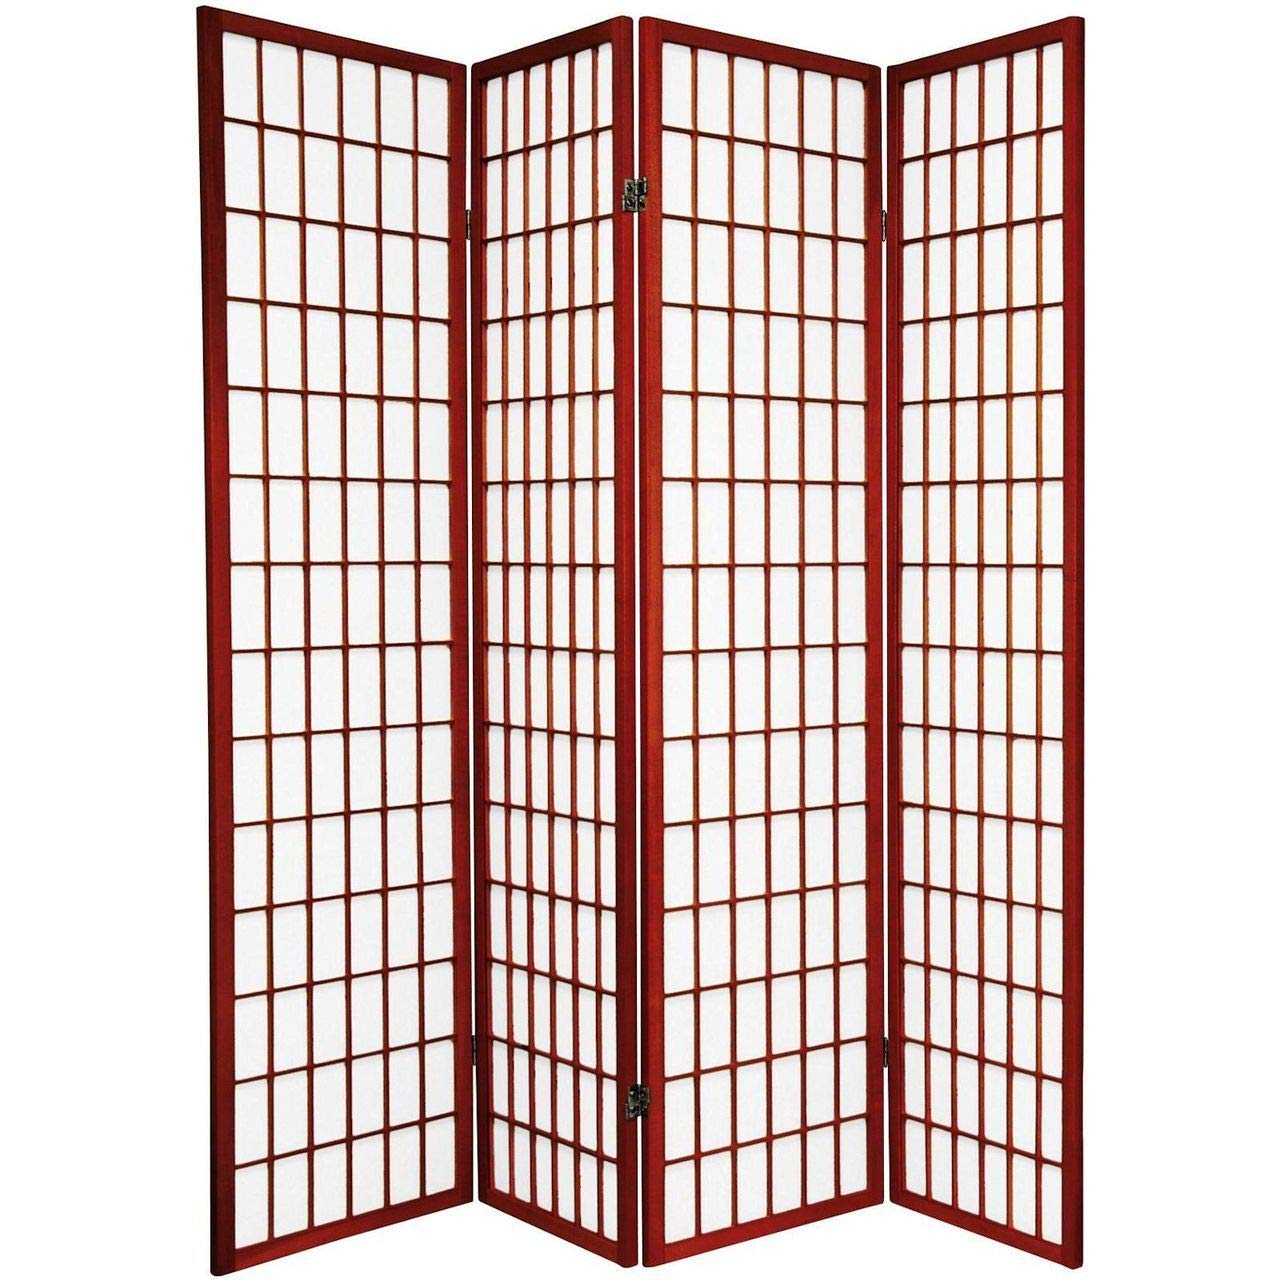 Legacy Decor 4-Panel Folding Shoji Screen Room Divider, Cherry Finish by Legacy Decor